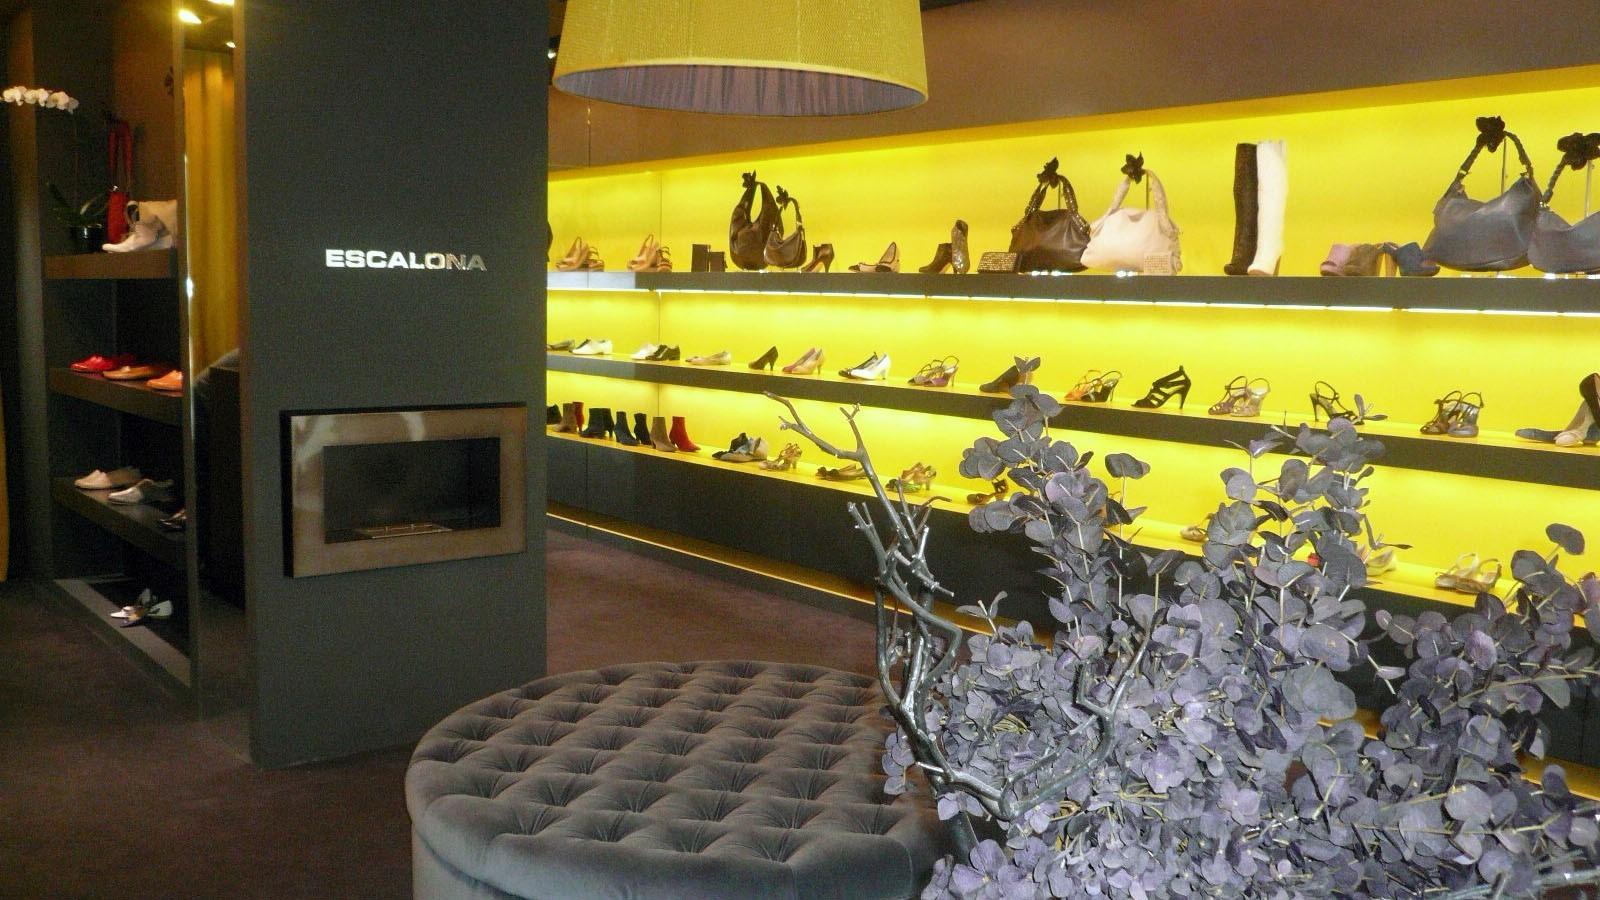 Boutique Escalona Paris Efi Design (7)